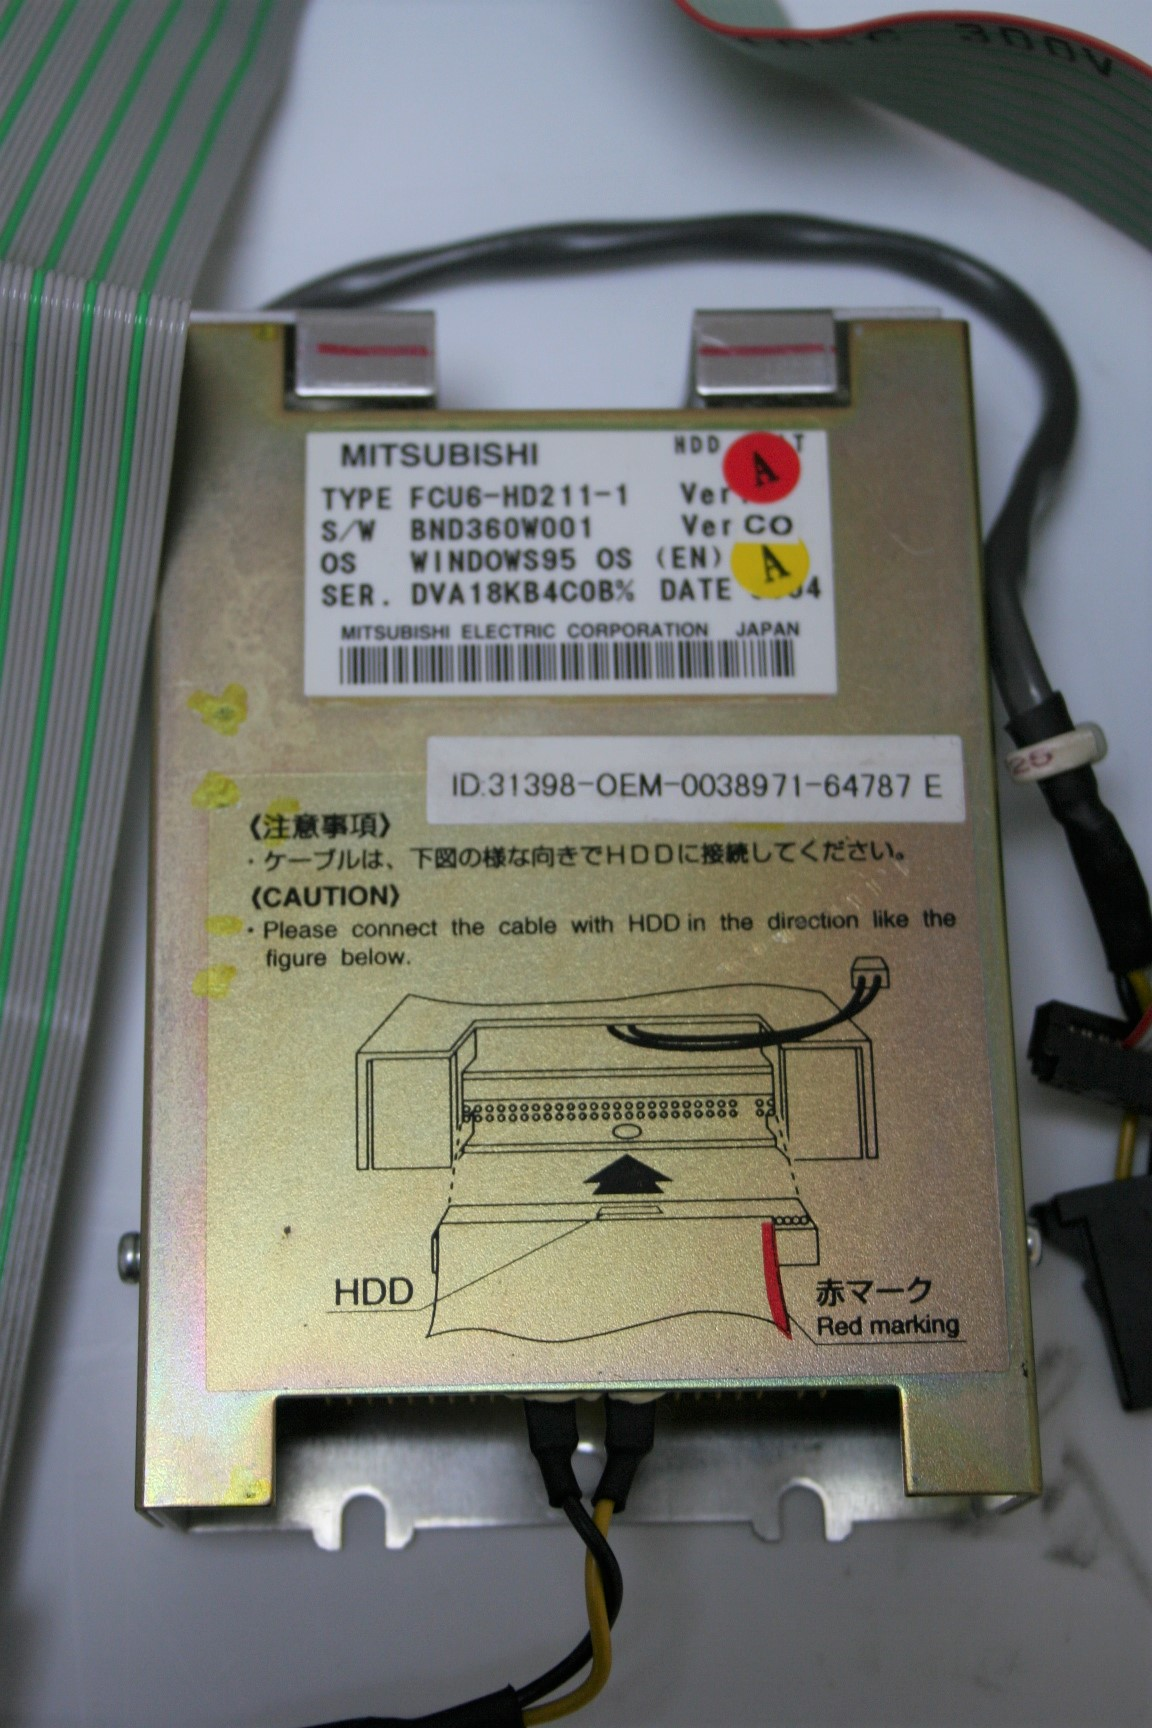 Mazak Mitsubishi Hard Drive FCU6-HD221-1 Version A and N/C FCA635MNY 2